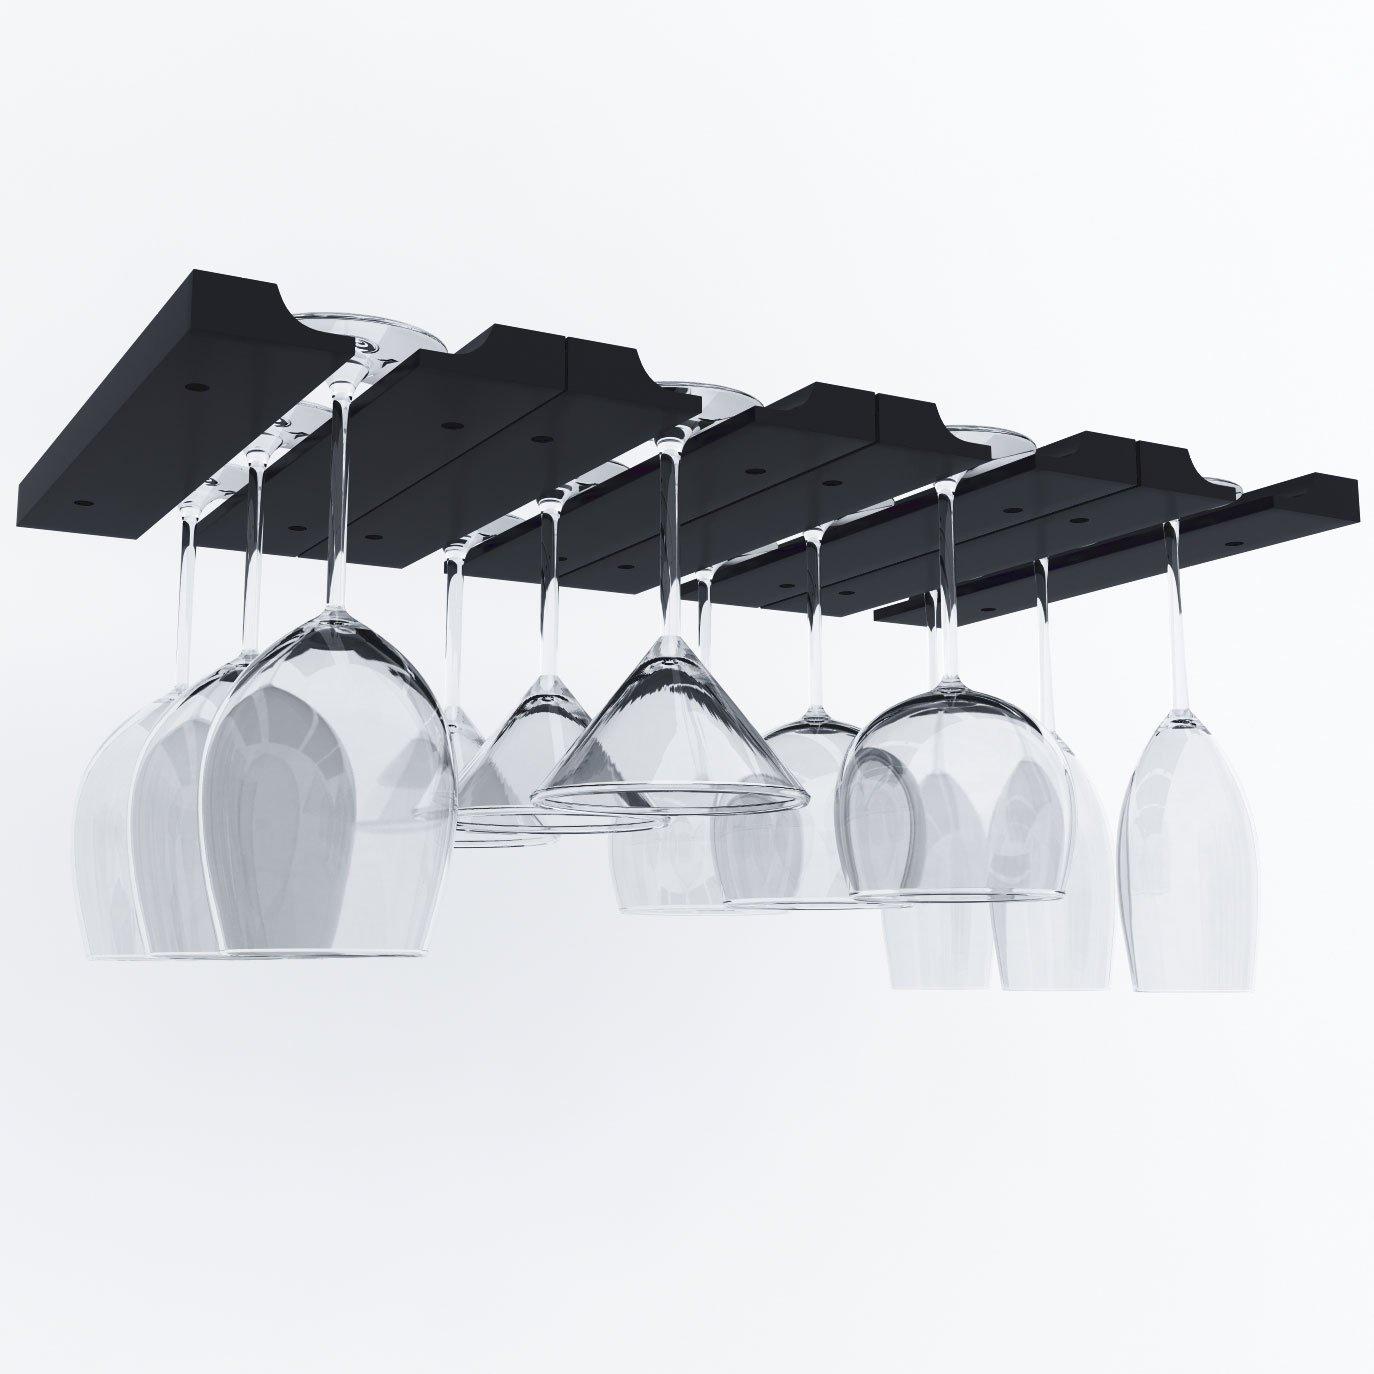 Hanging Under Cabinet Stemware Wine Glass Holder Rack , Adjustable Stemware Glass Storage Wood , Pack of 2 (Black) by ArtifactDesign